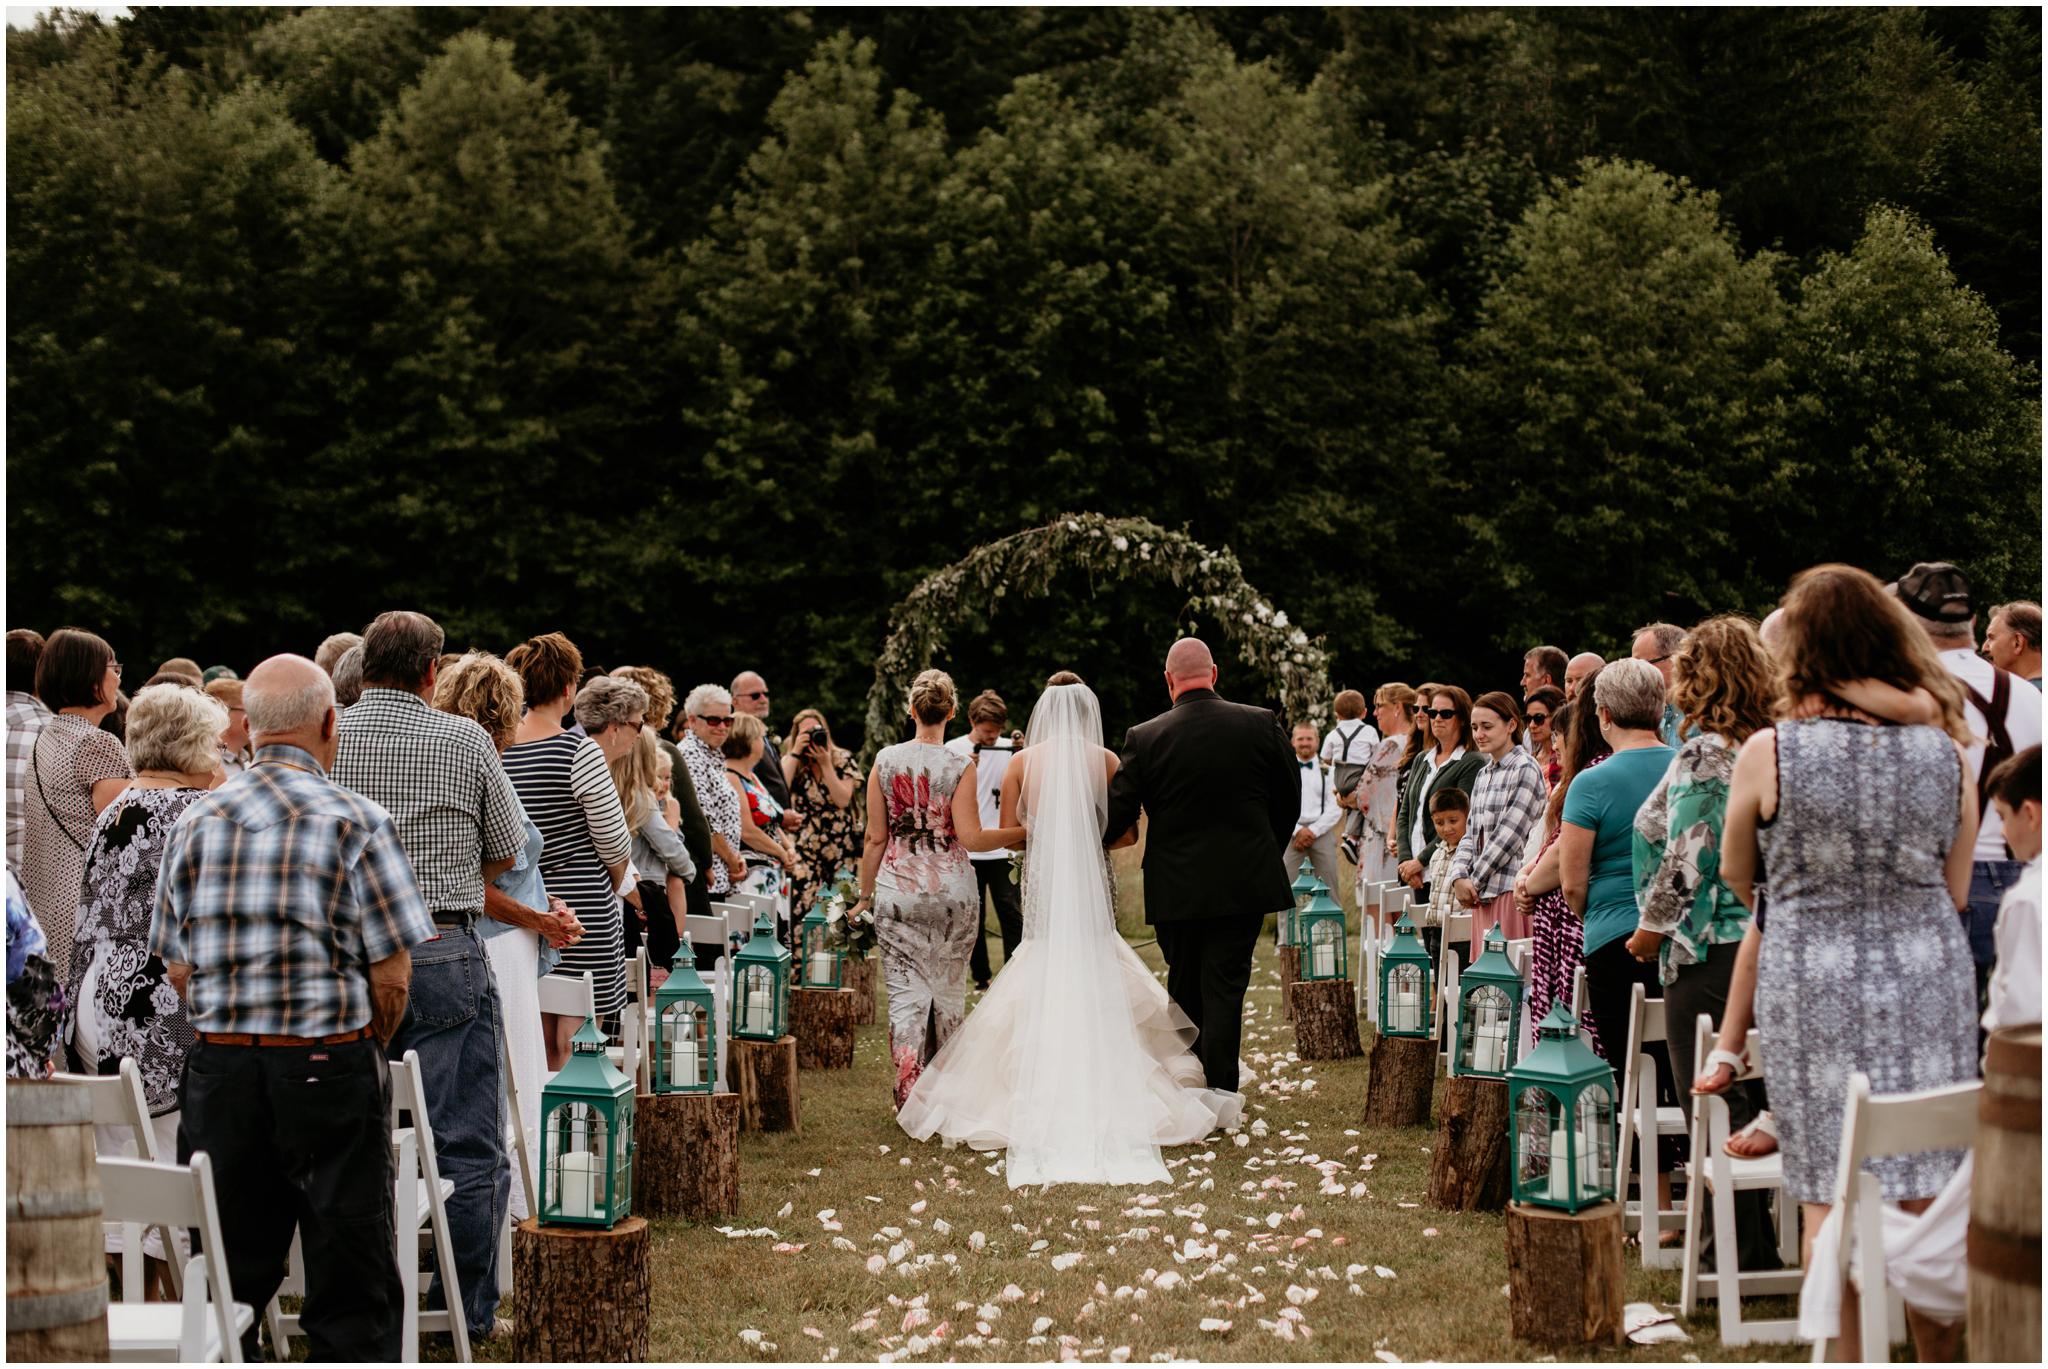 alex-and-matthew-three-cs-farm-venue-seattle-wedding-photographer-101.jpg